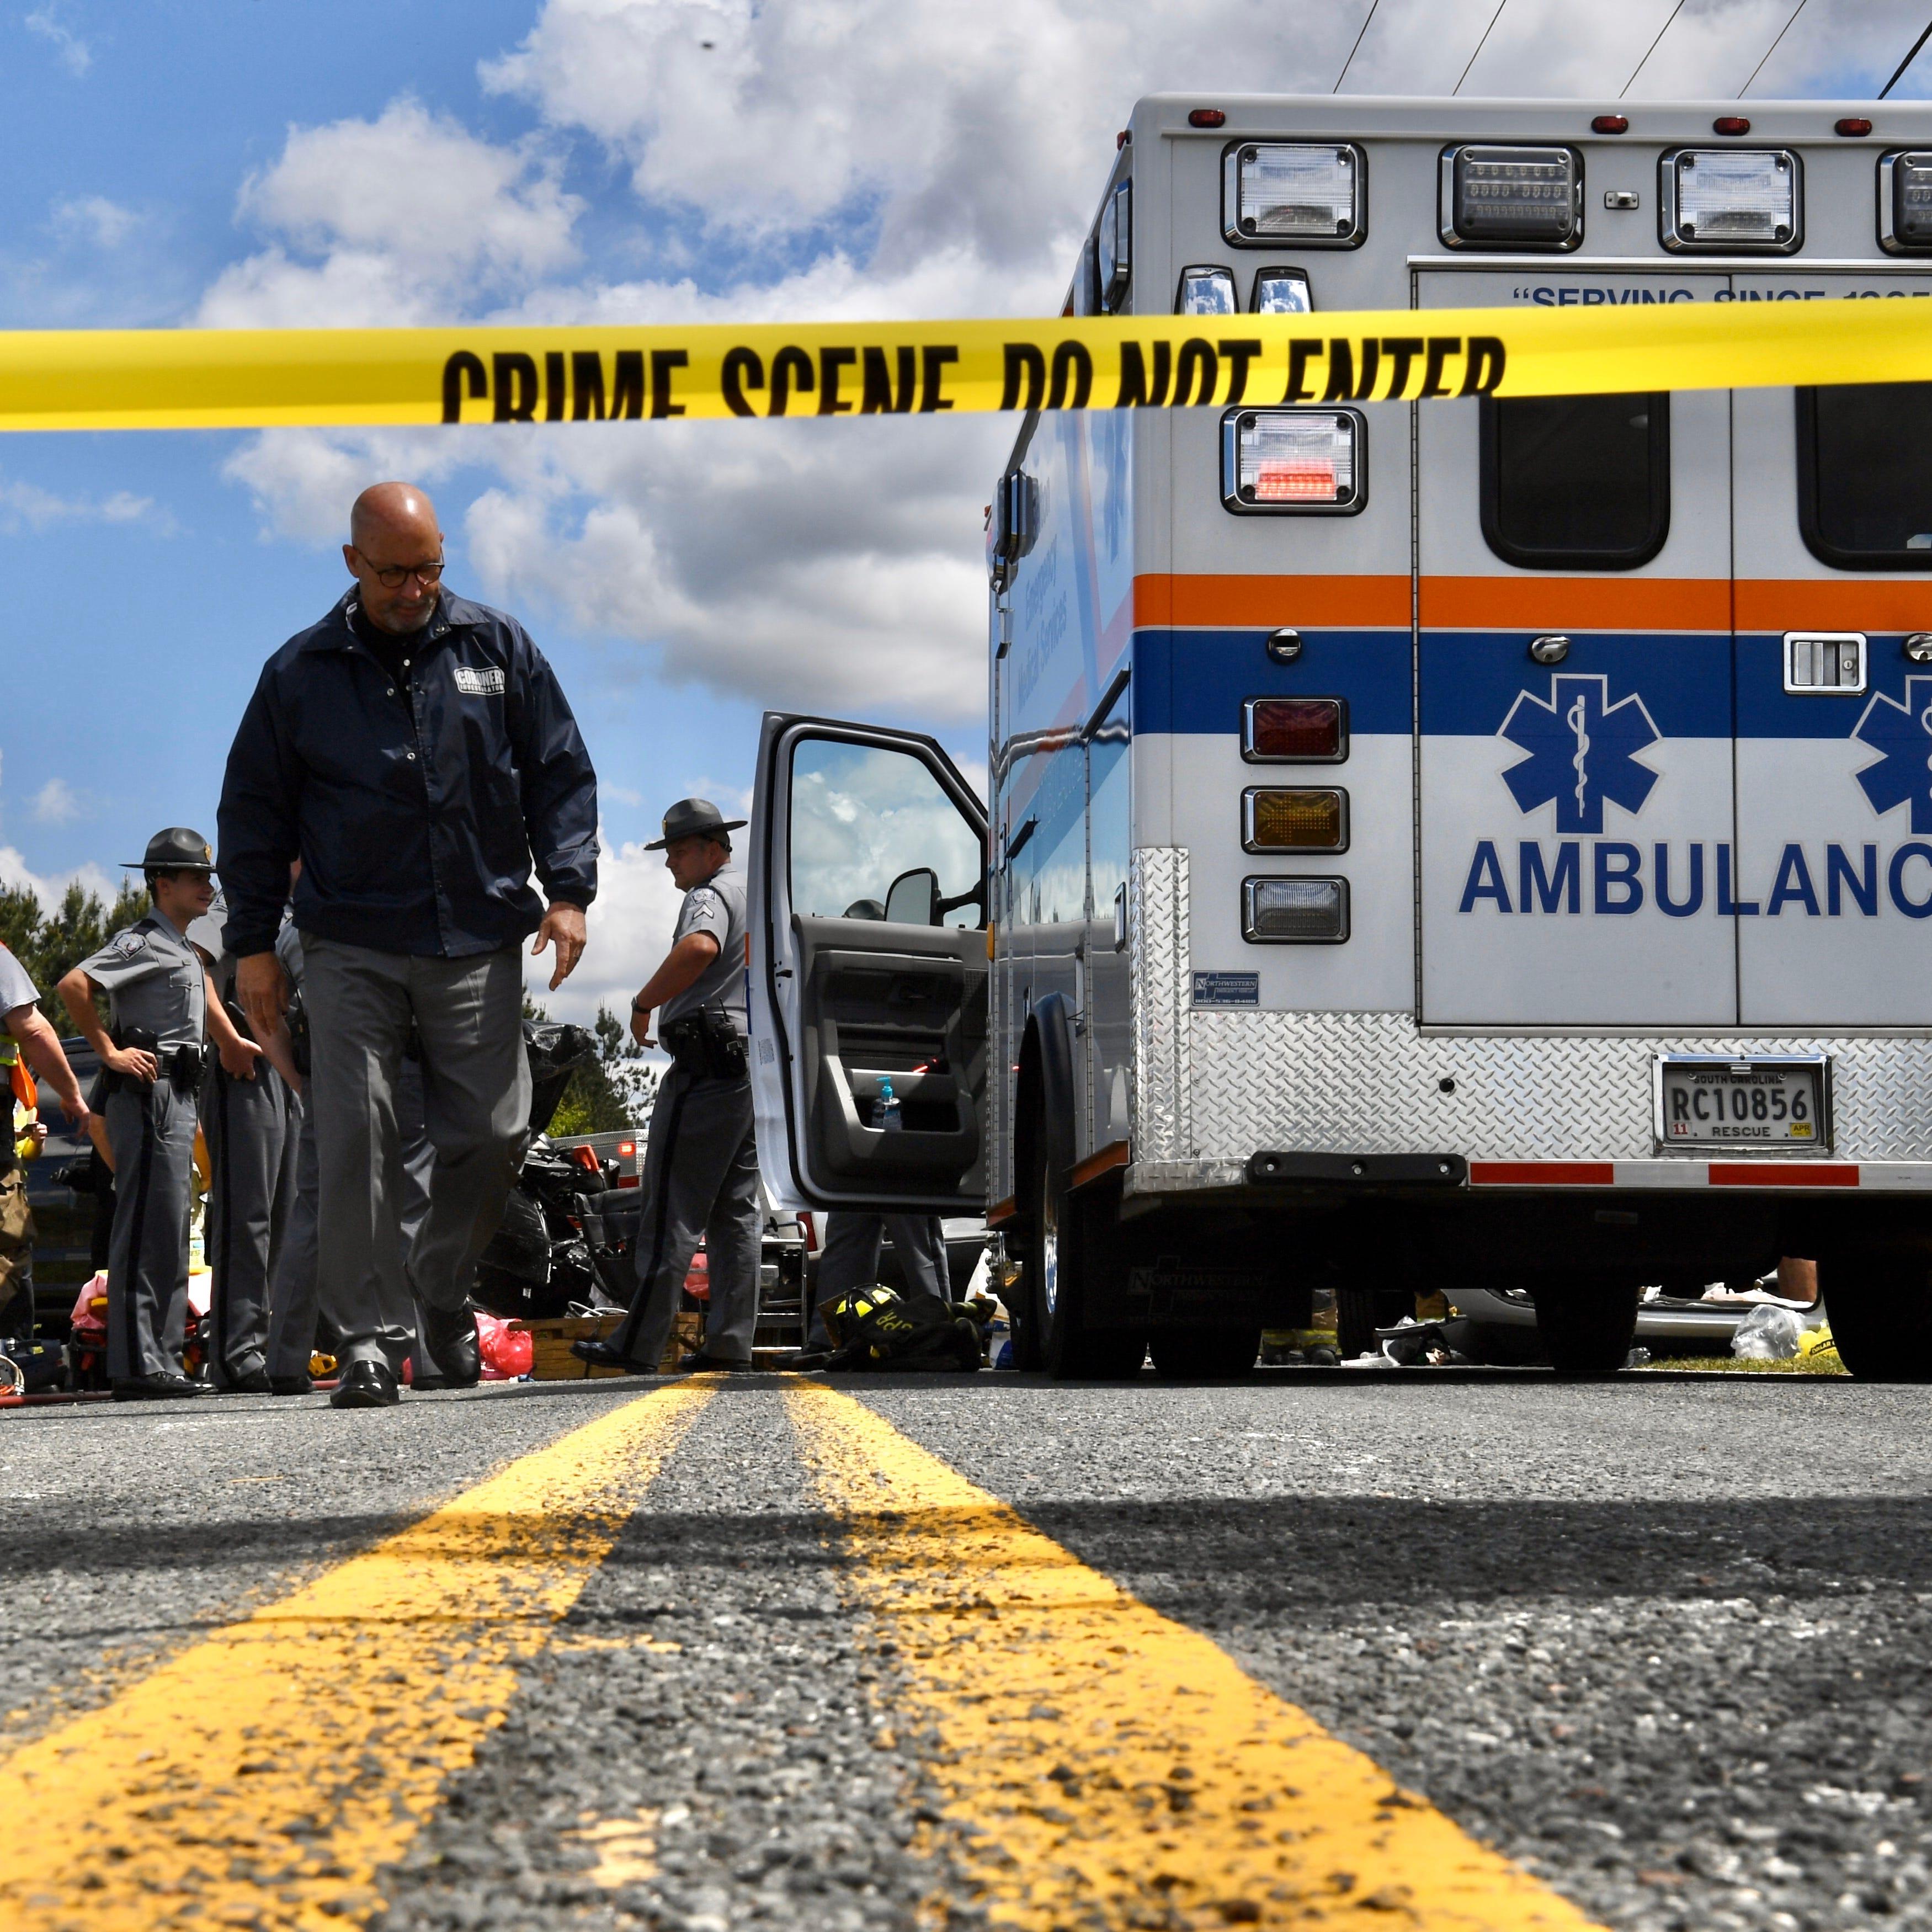 seneca teen killed in two vehicle wreck in anderson county two vehicle wreck in anderson county